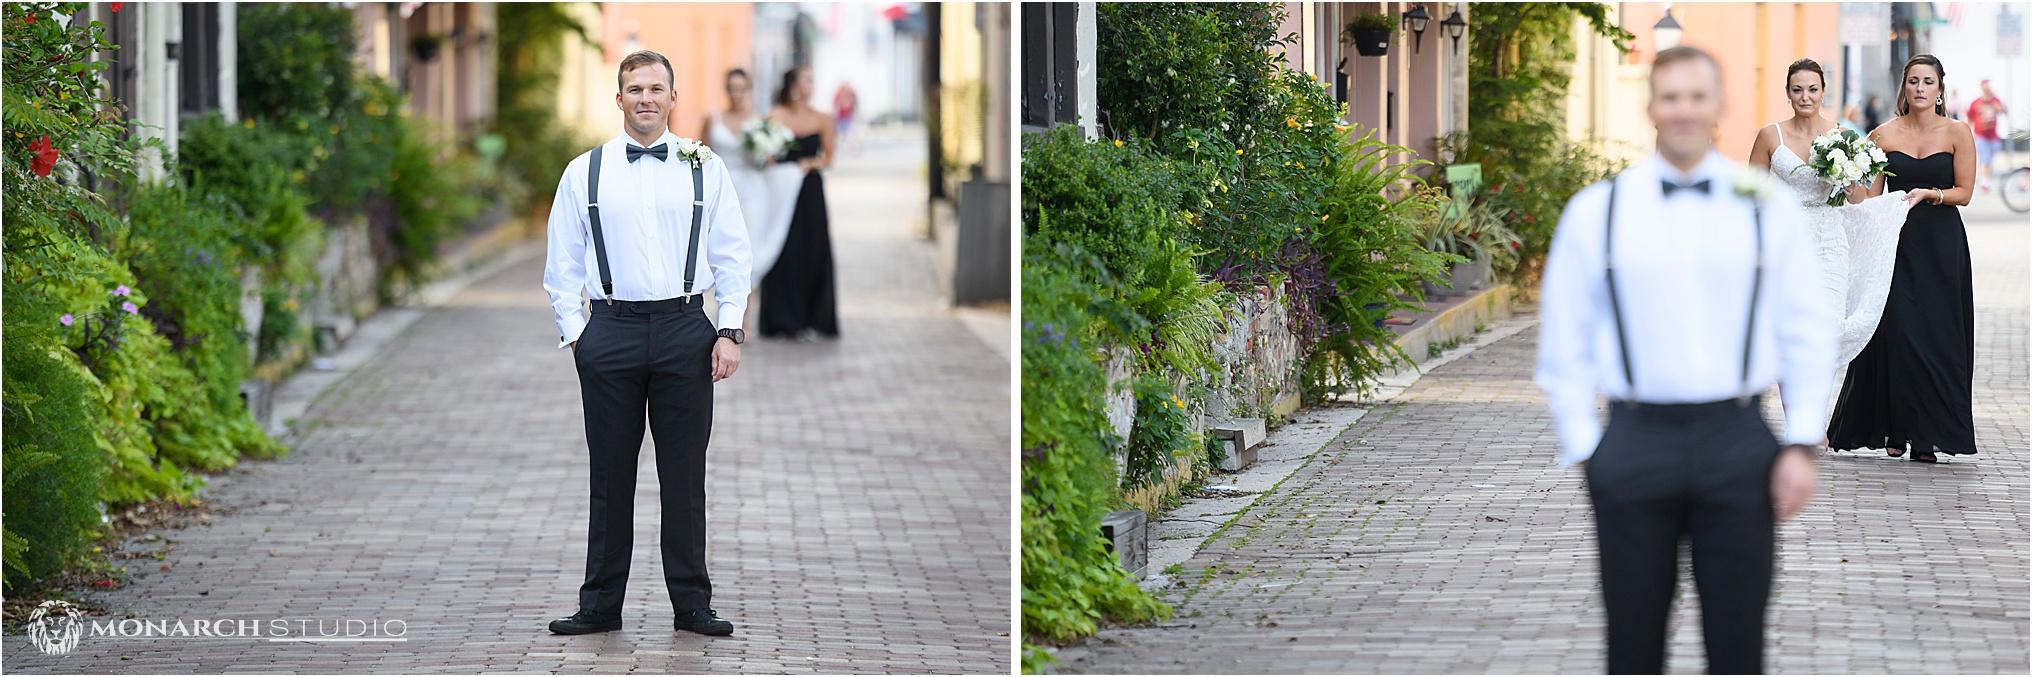 039-whiteroom-wedding-photographer-2019-05-22_0021.jpg